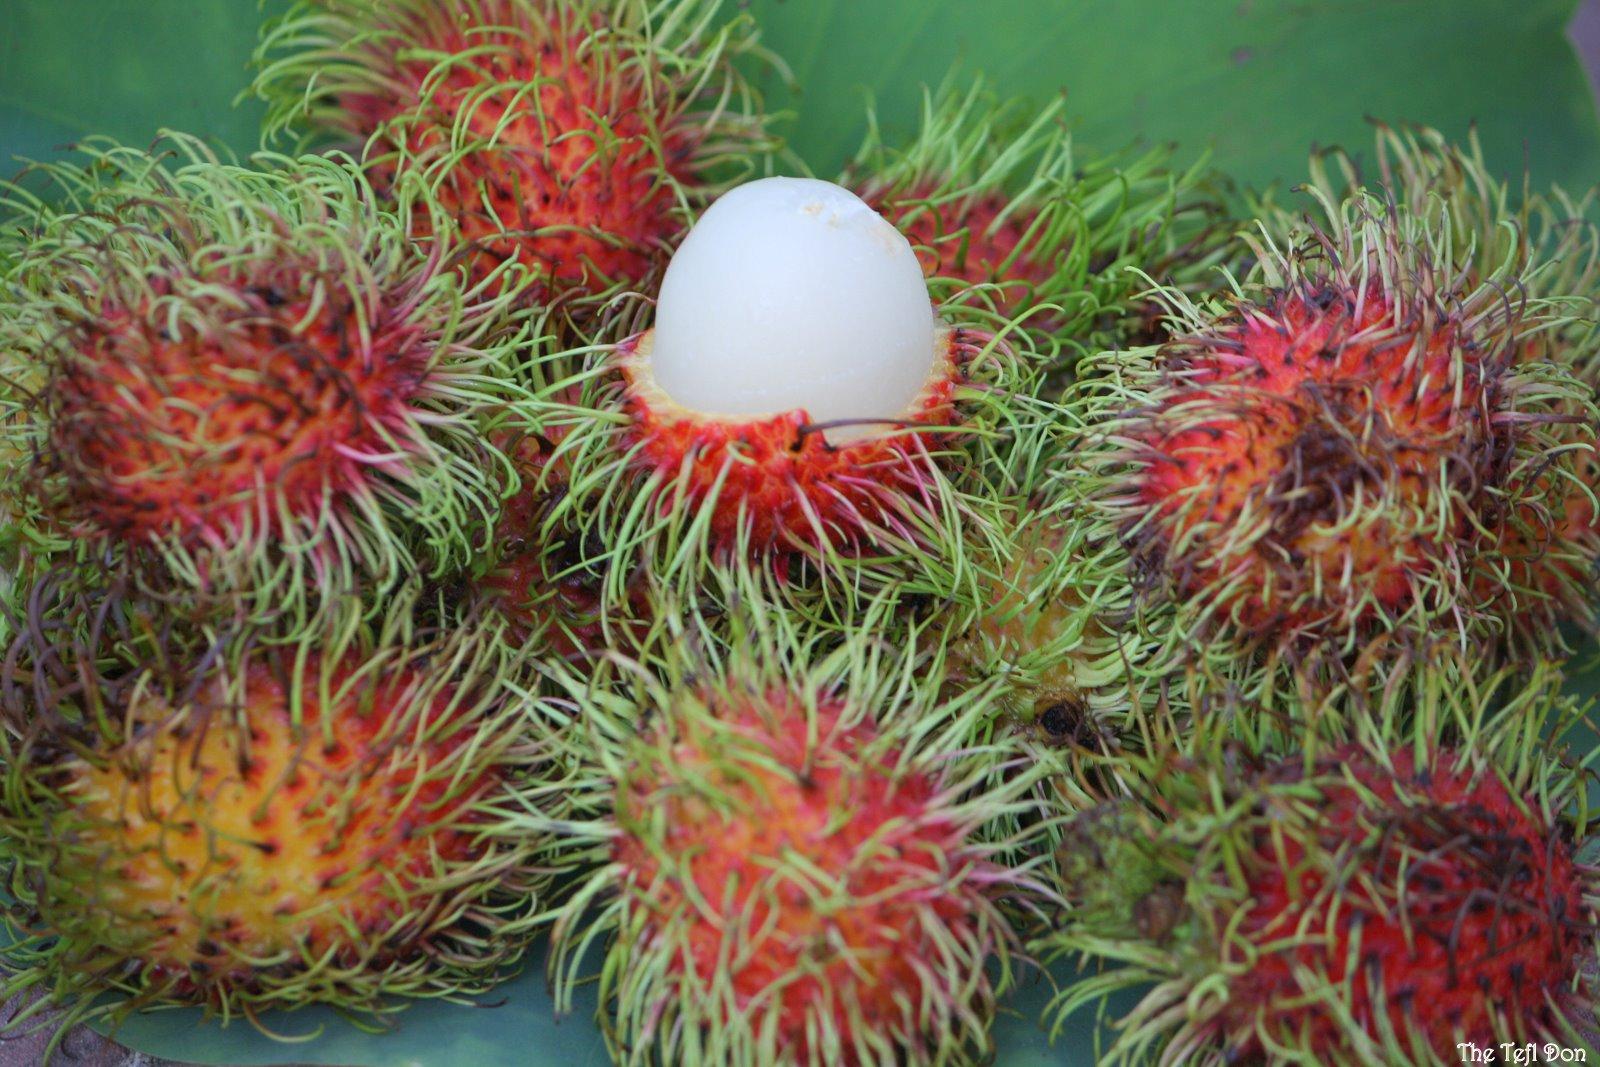 http://4.bp.blogspot.com/-84lPN1WaMAo/TZyYA9Rlp-I/AAAAAAAABK0/siEewSKGKgc/s1600/Rambutan+Fruit+Tropical+Fruit.JPG